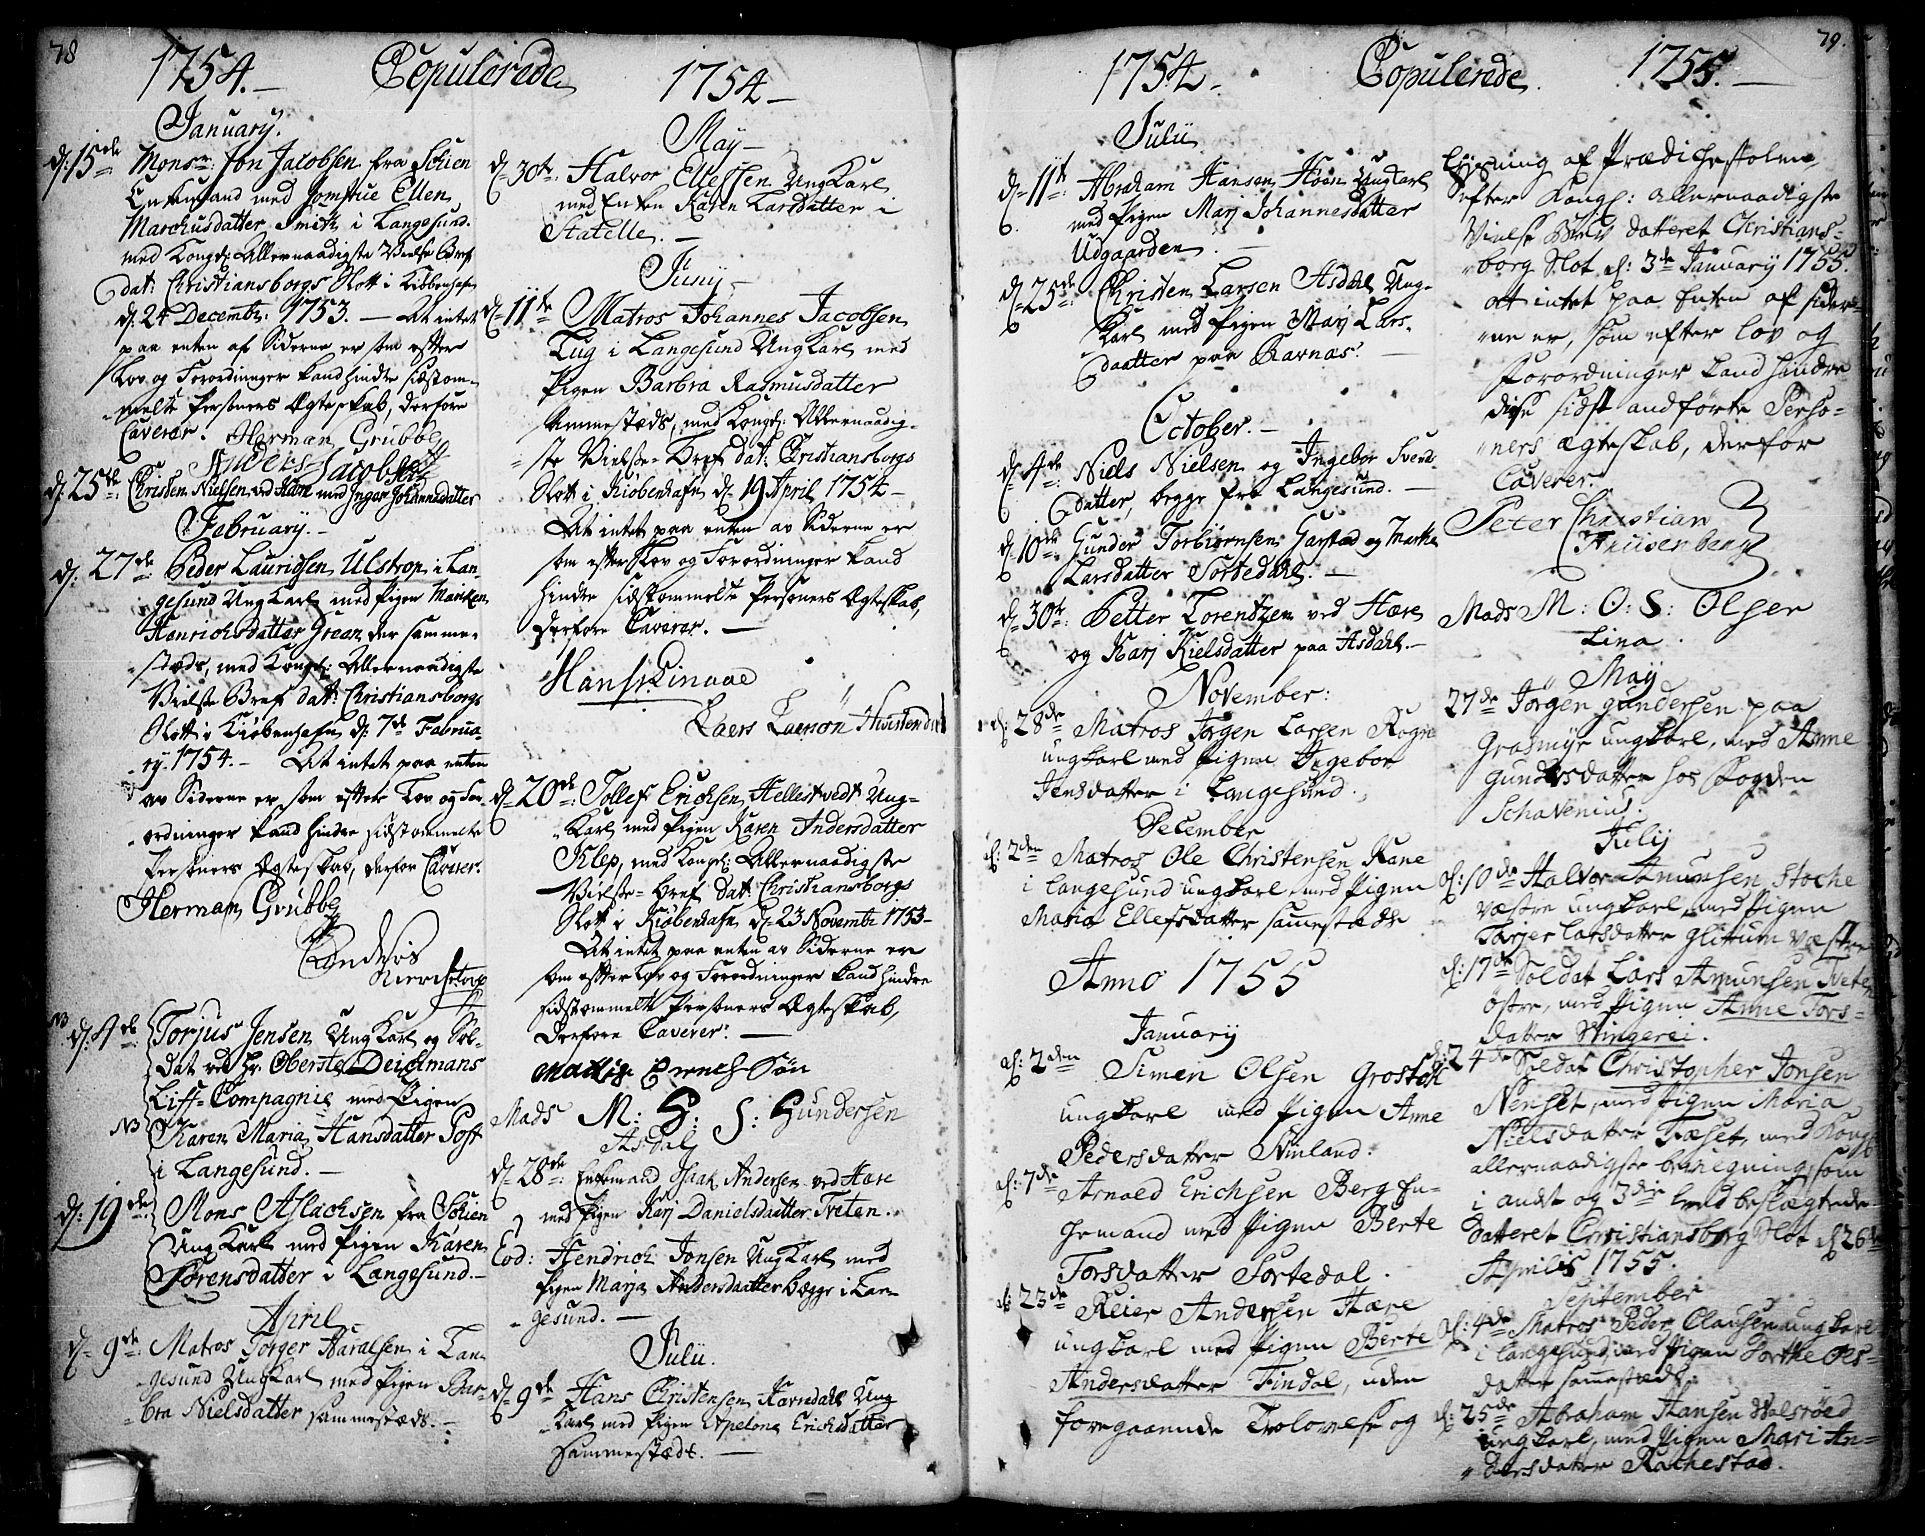 SAKO, Bamble kirkebøker, F/Fa/L0001: Ministerialbok nr. I 1, 1702-1774, s. 78-79